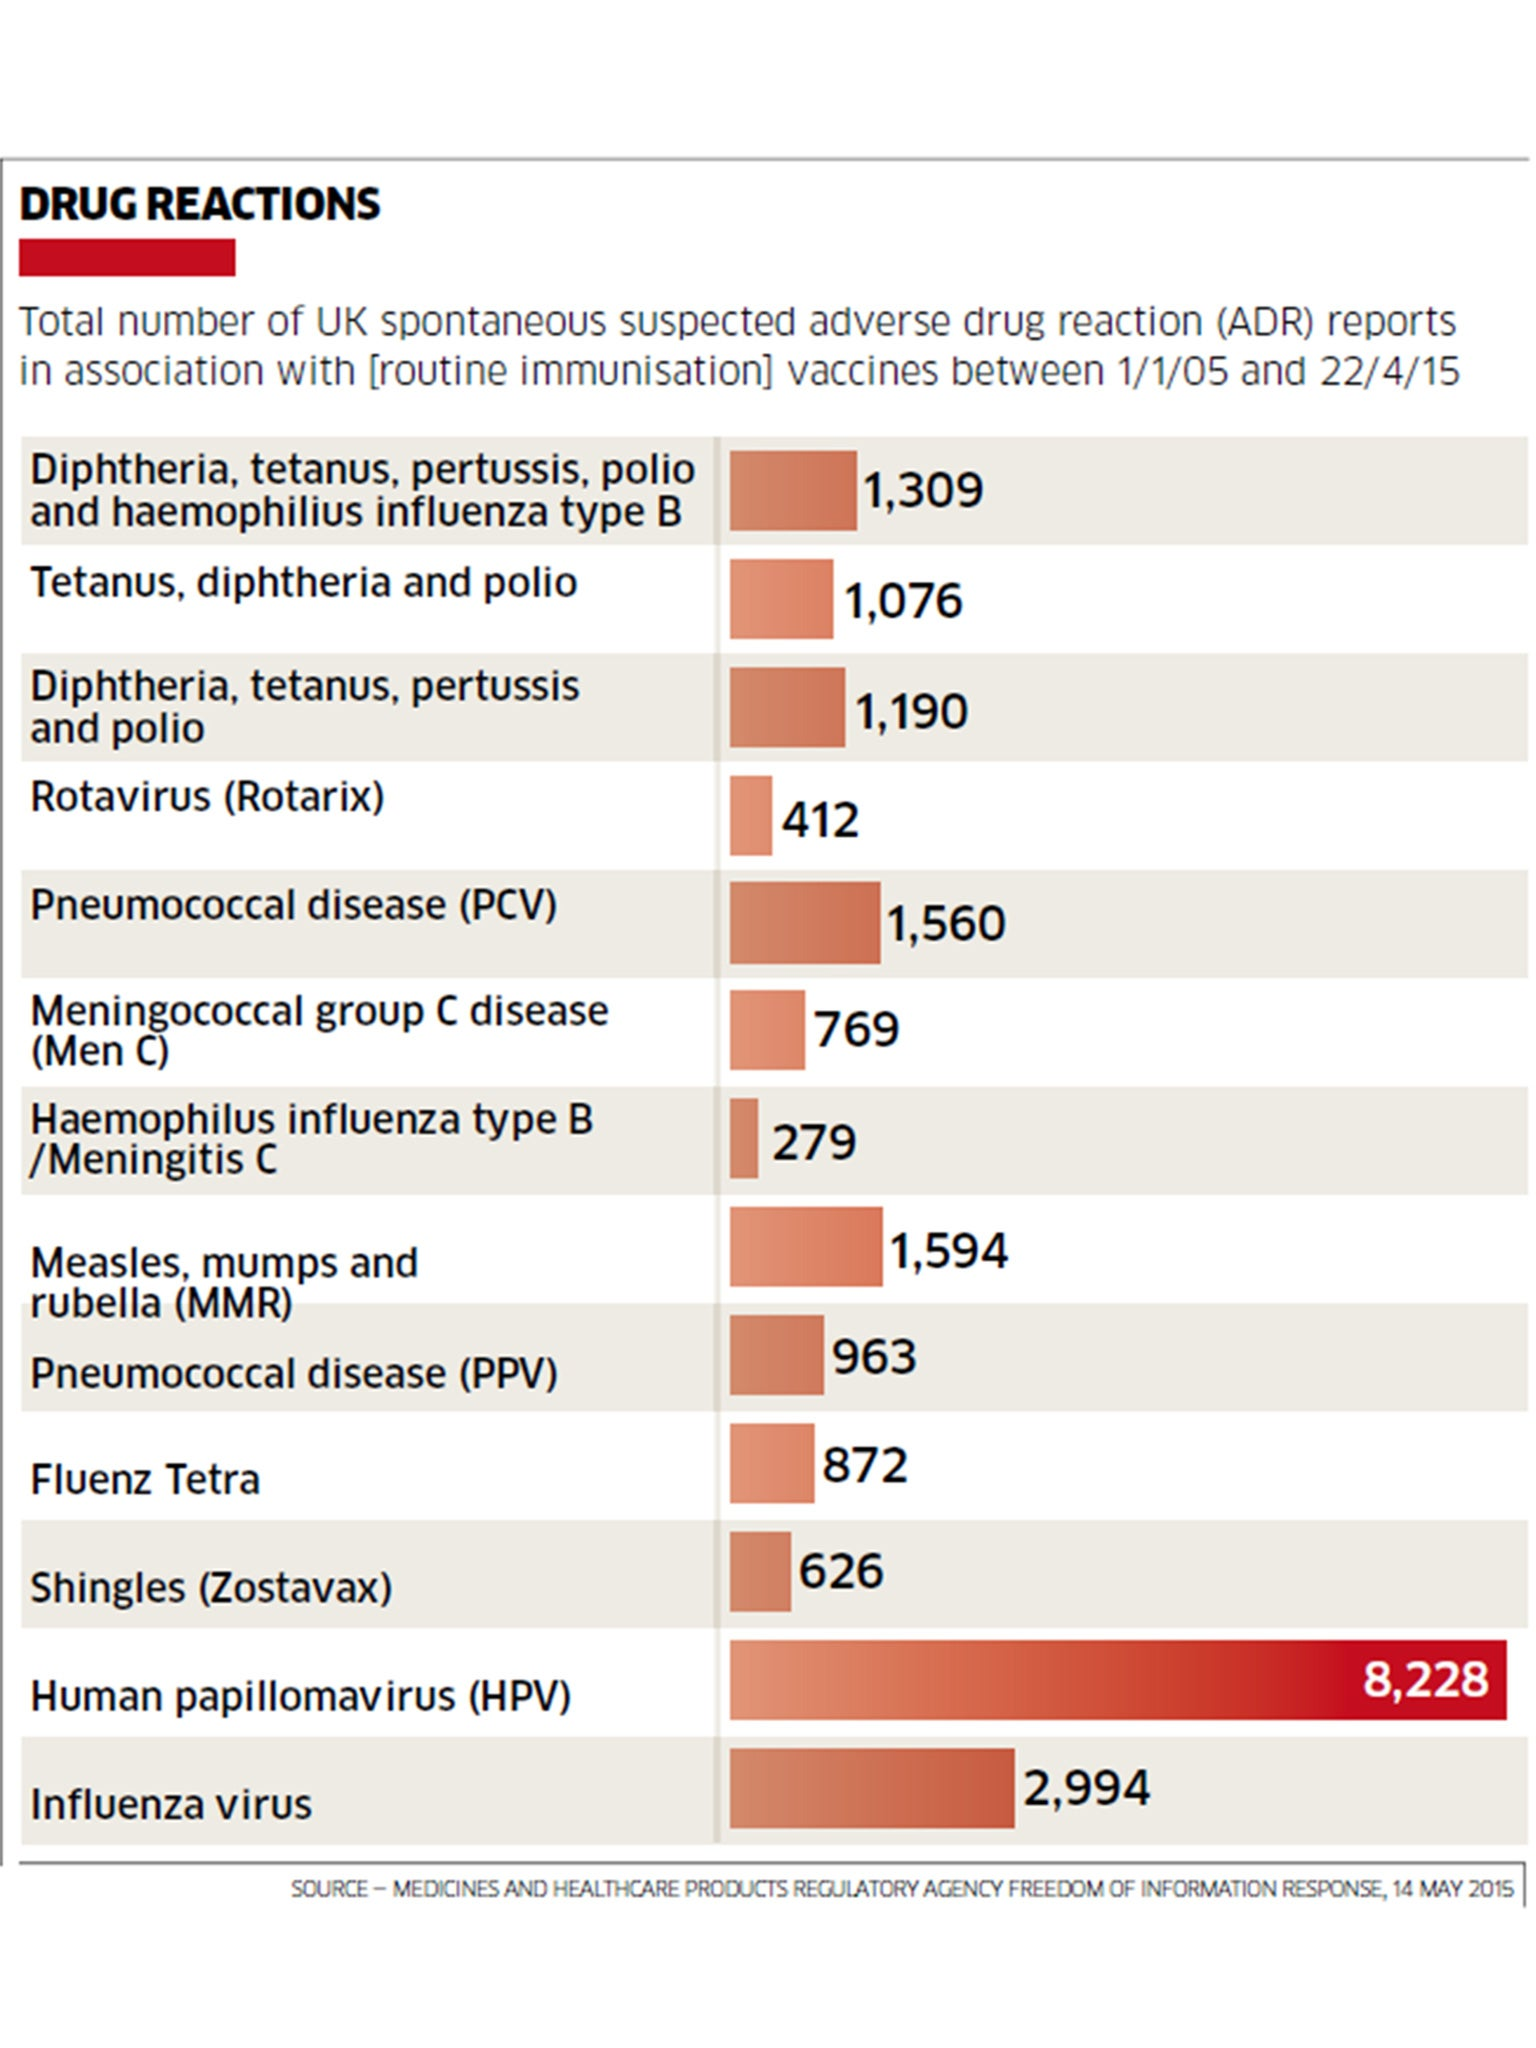 human papillomavirus immunization side effects